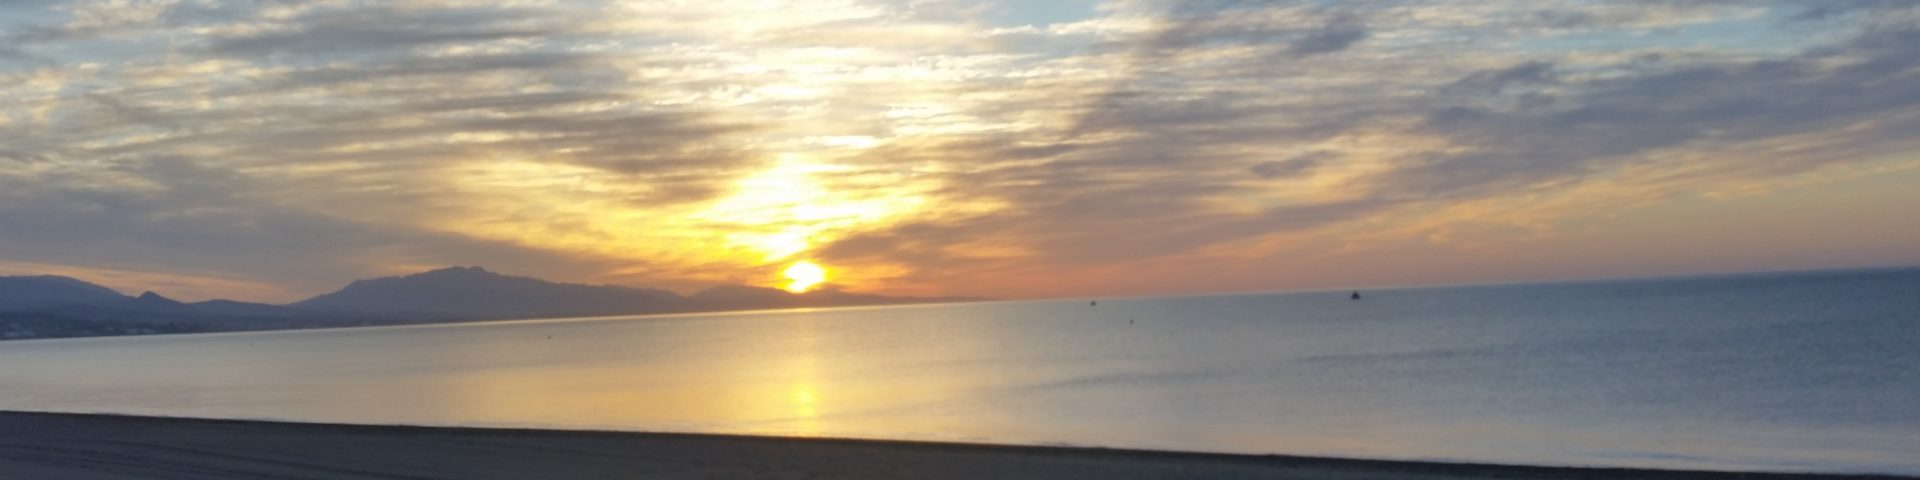 Sabinillas Sunrise